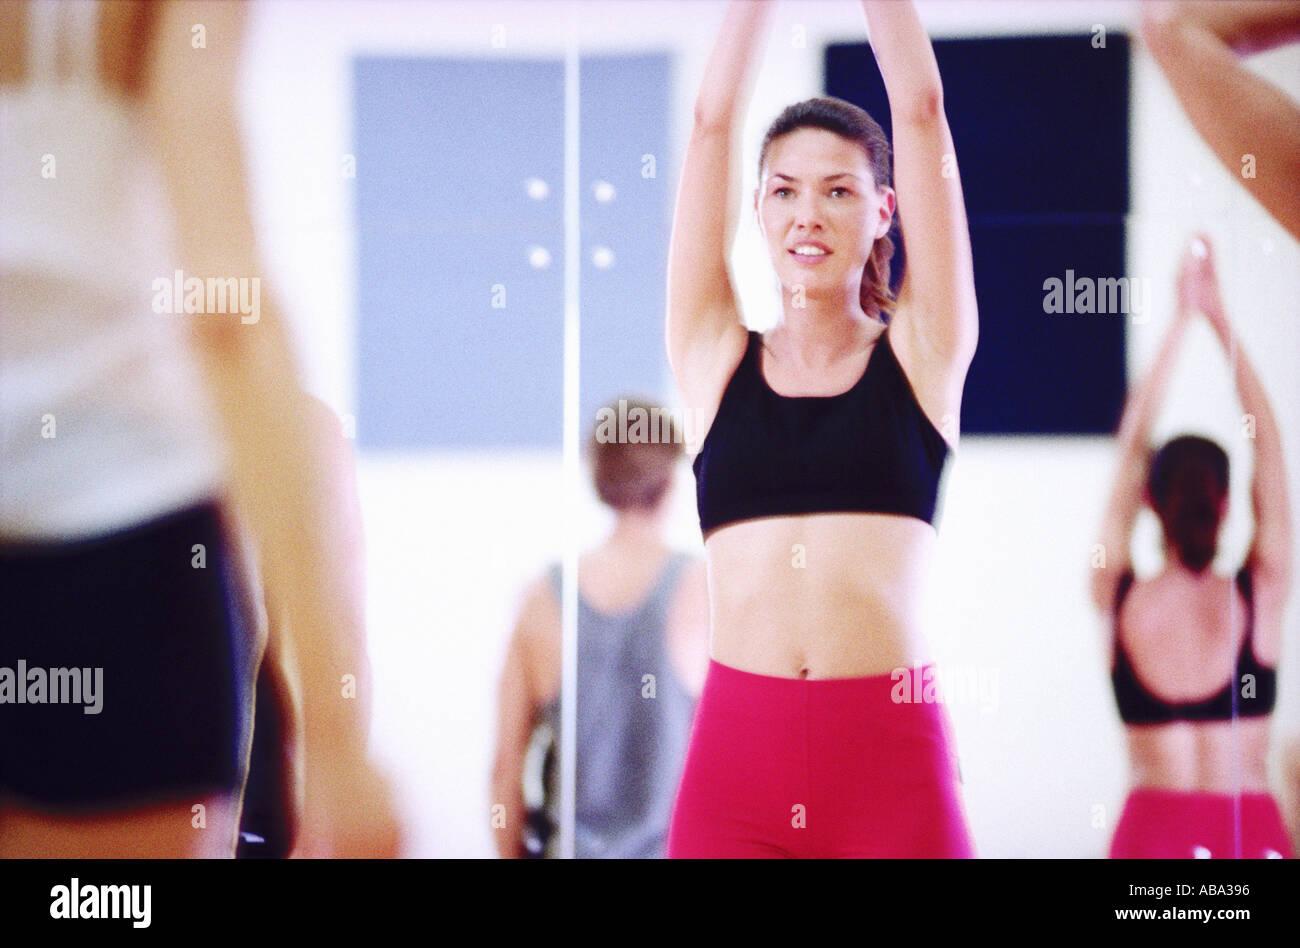 Young woman practising yoga - Stock Image